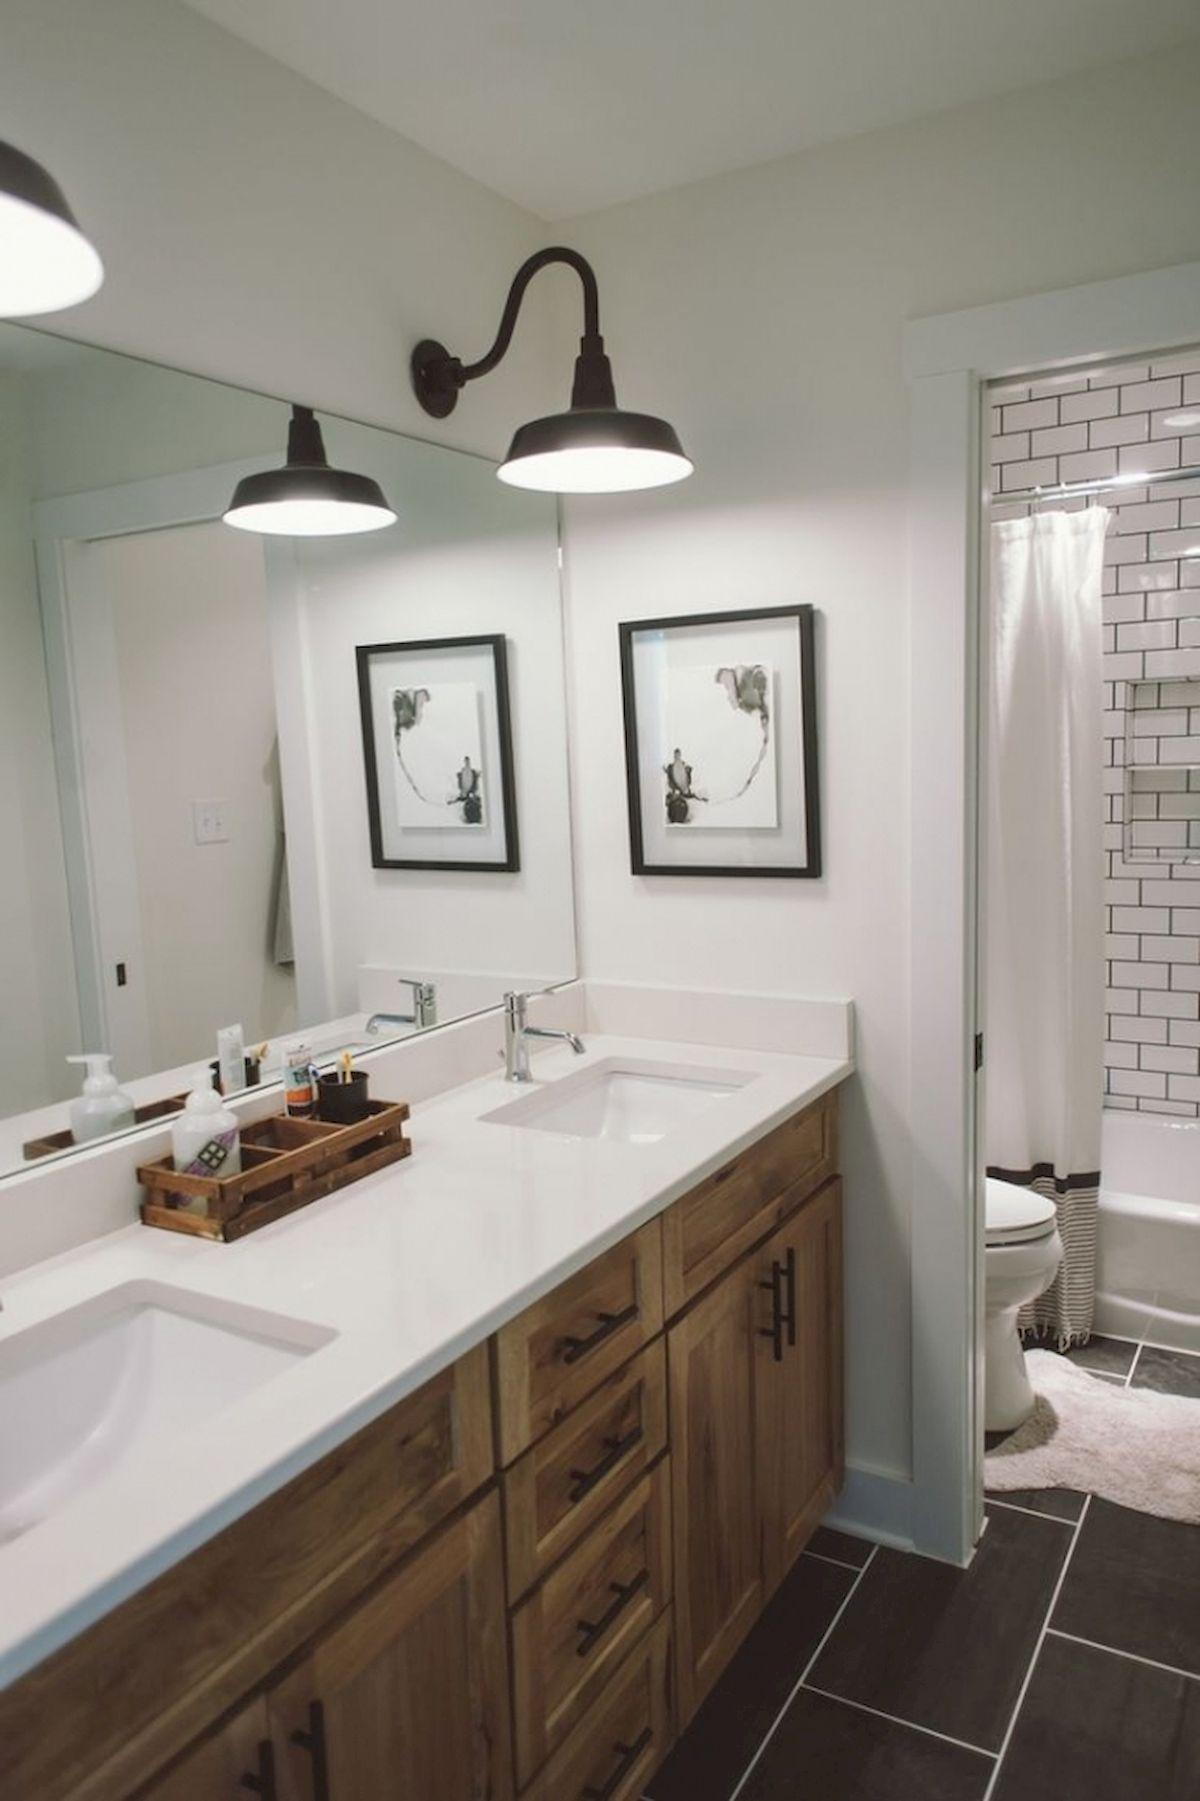 Floor 55 Bathroom Lighting Ideas For Every Style Modern Light Fixtures Bathroom Vanity Remodel Bathroom Remodel Master Modern Farmhouse Bathroom